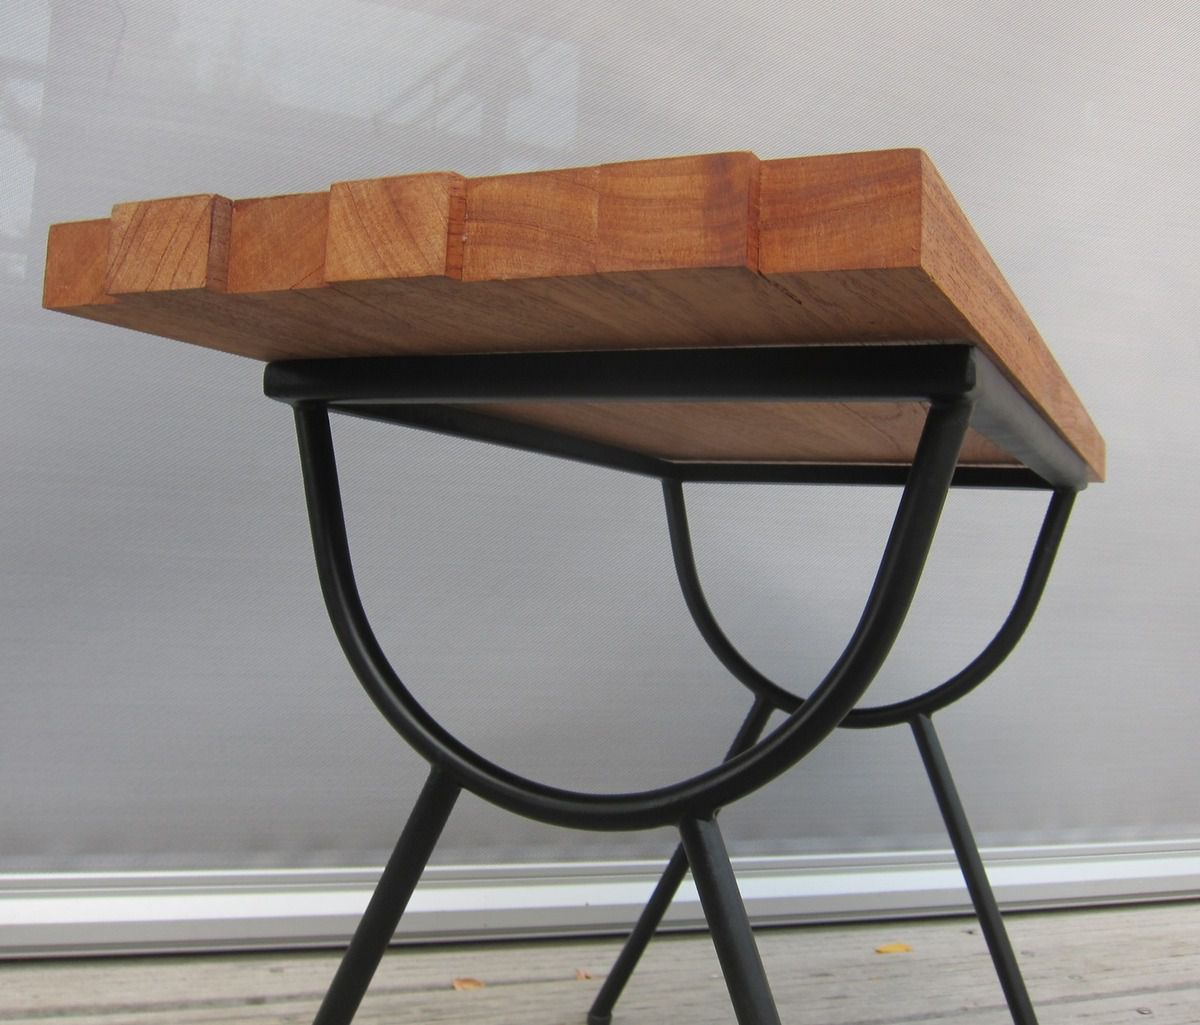 TABLE BASSE 1950 ASYMETRIQUE - 200 euros